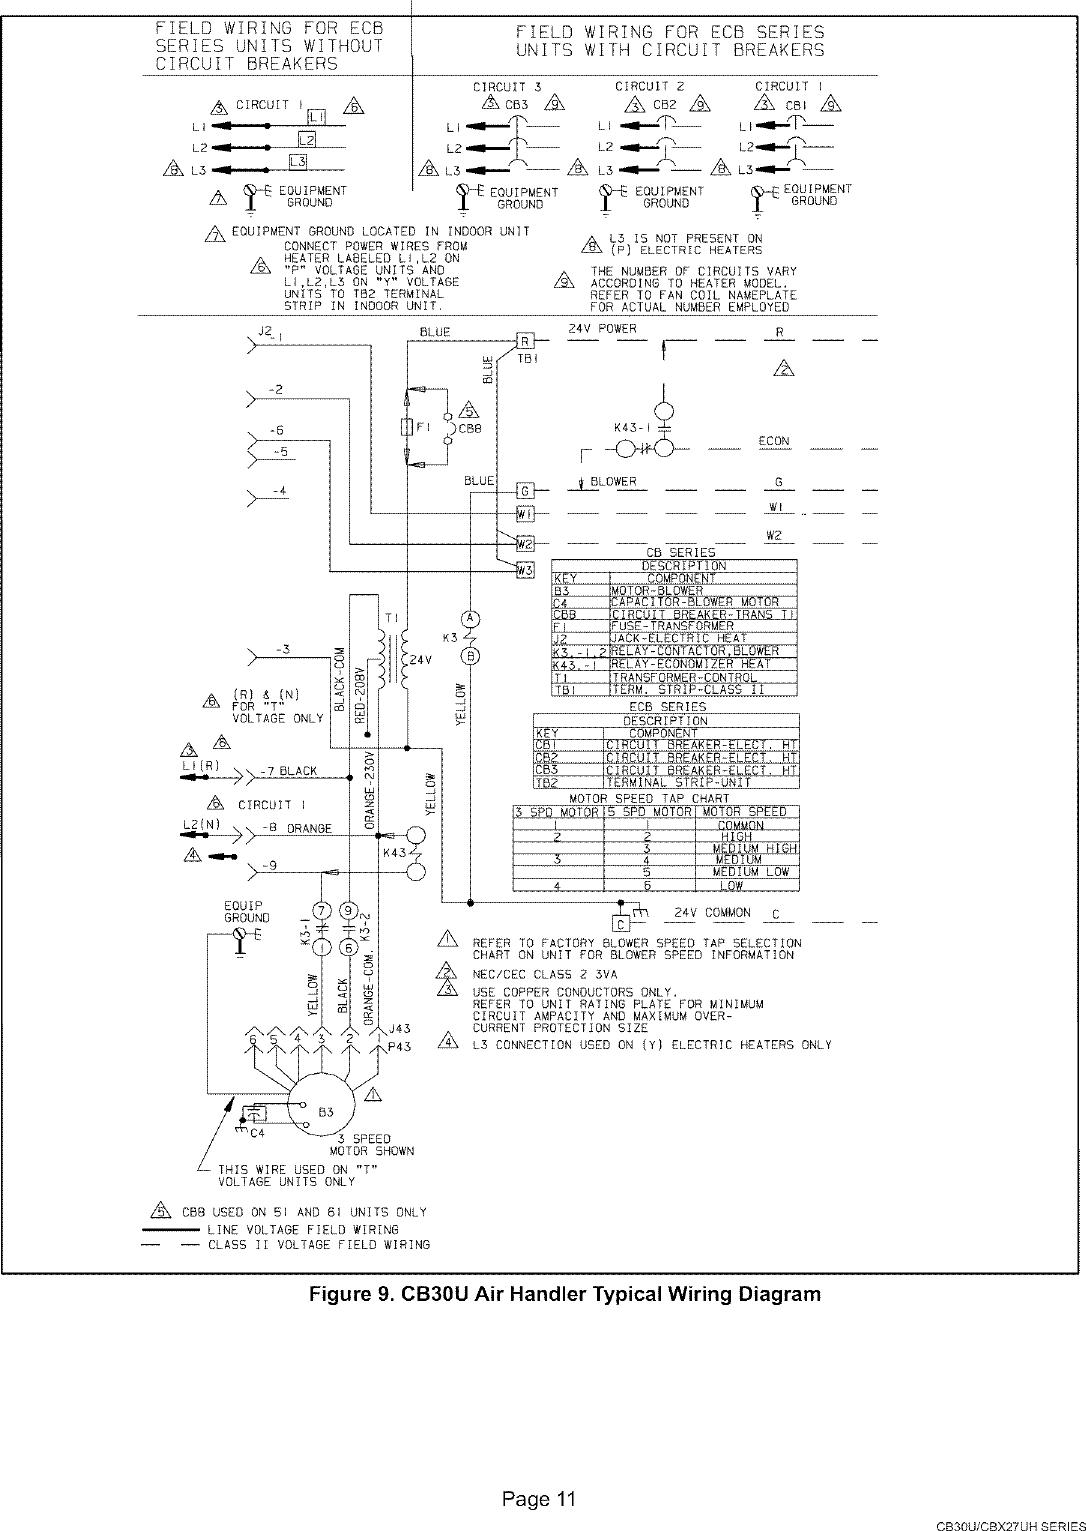 Lennox Air Handler Indoor Blowerevap Manual L0805327 Wiring Diagram Page 11 Of 12